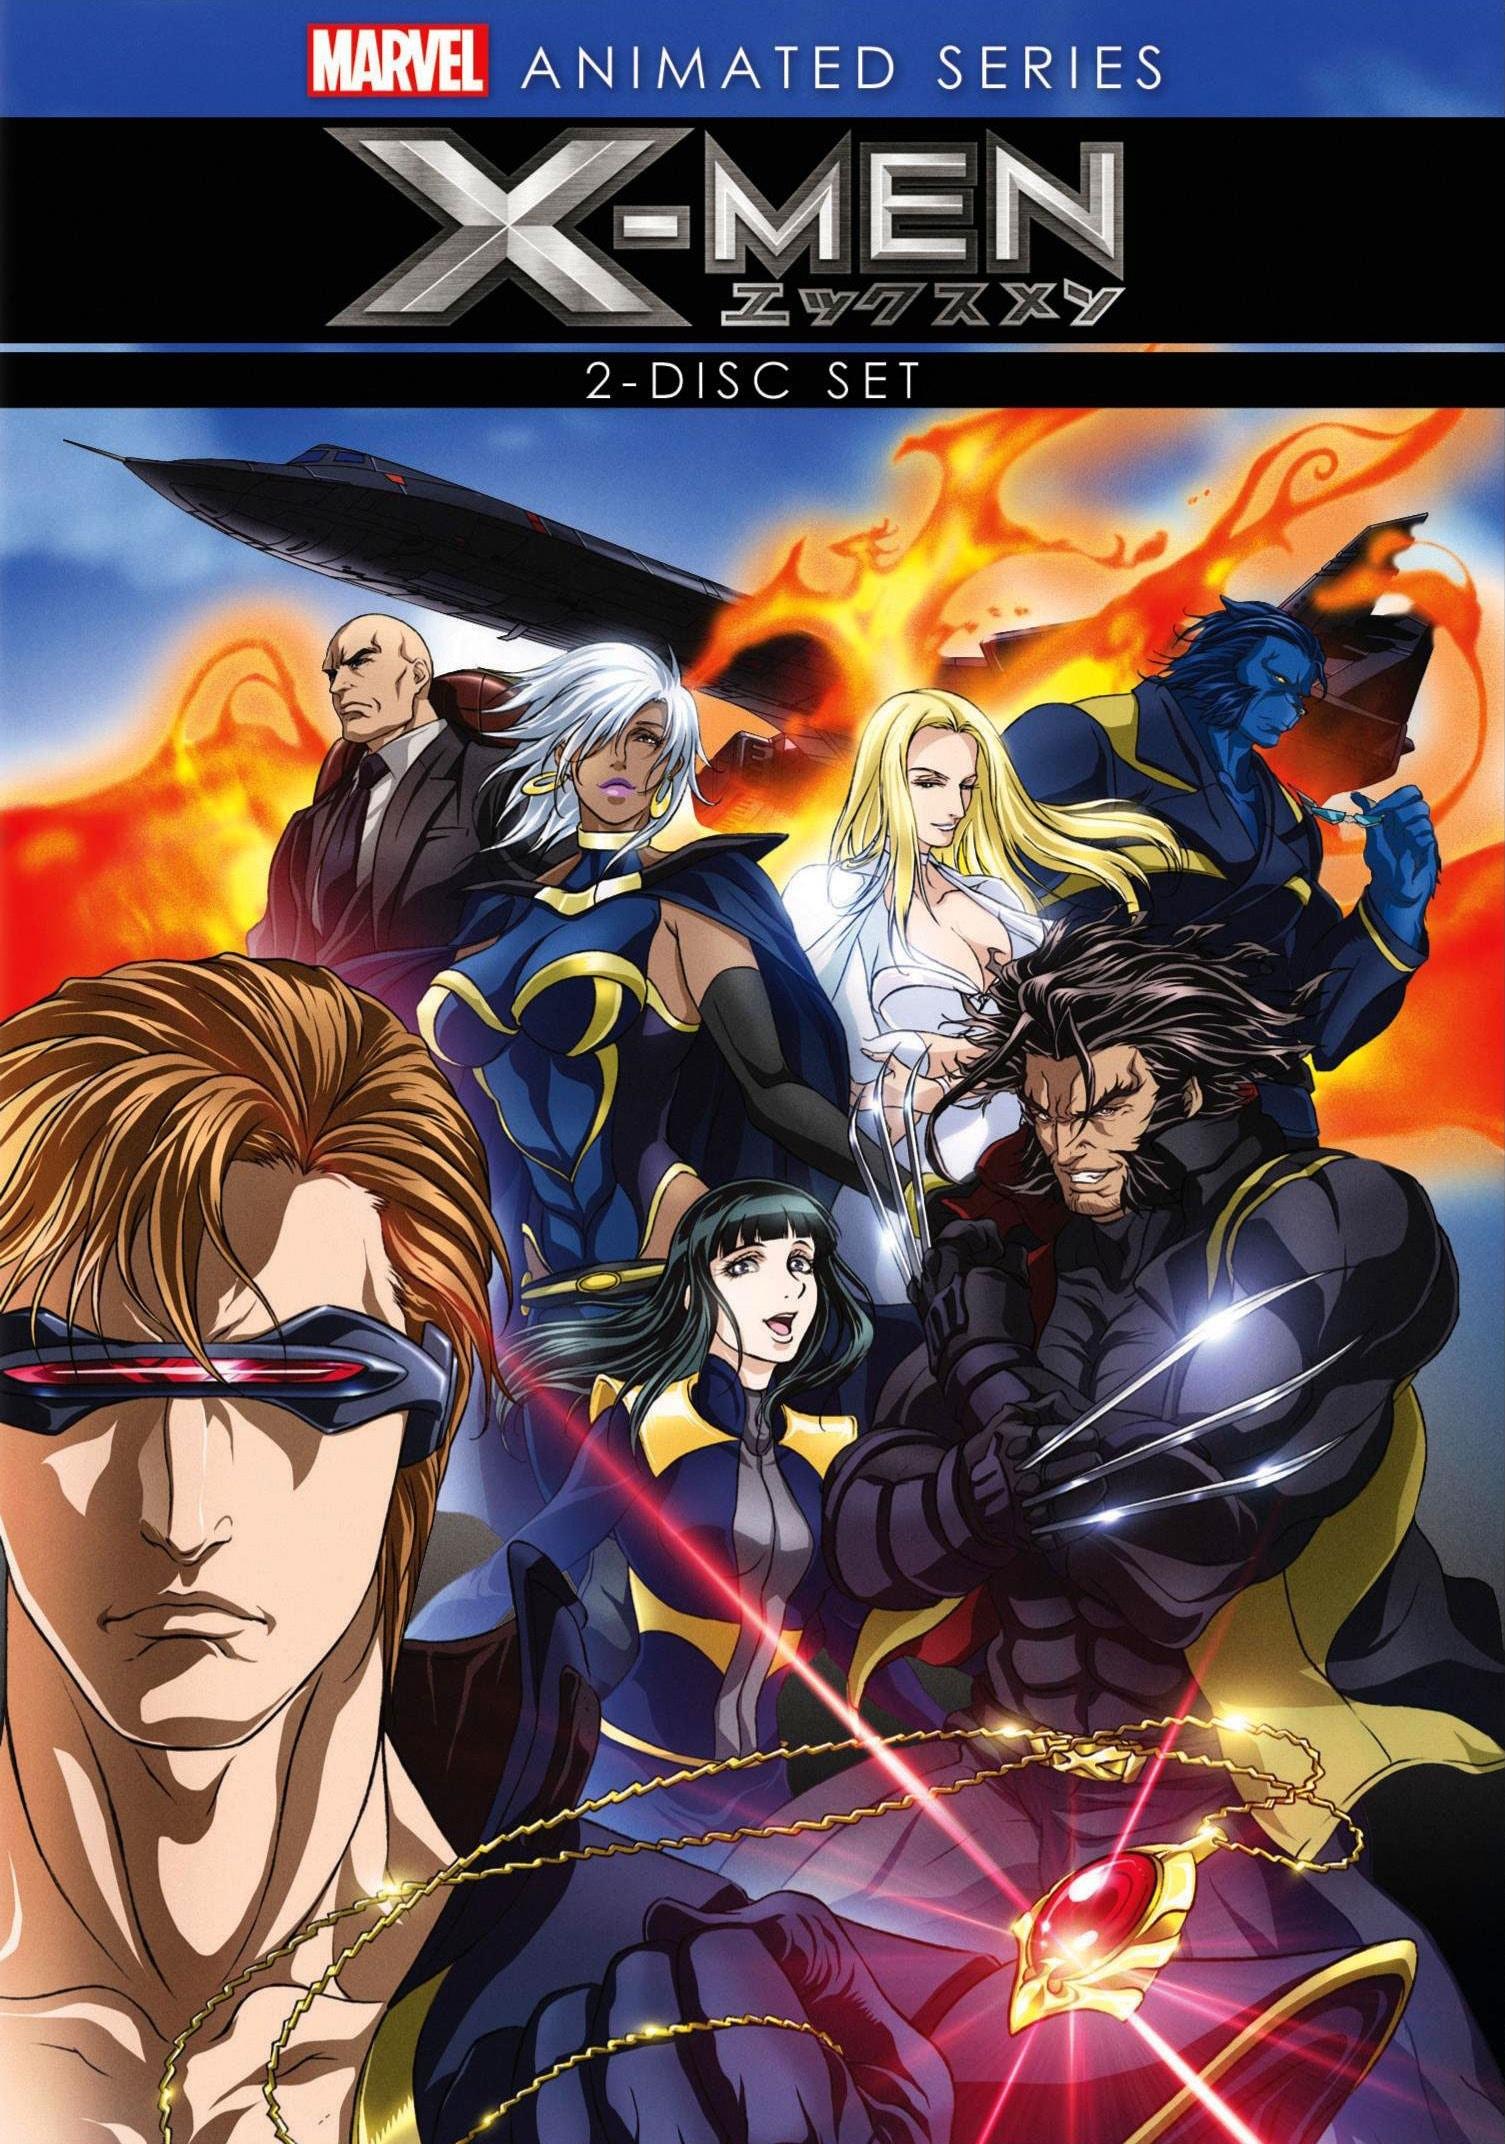 Marvel Animation: X-Men Complete Series (DVD)